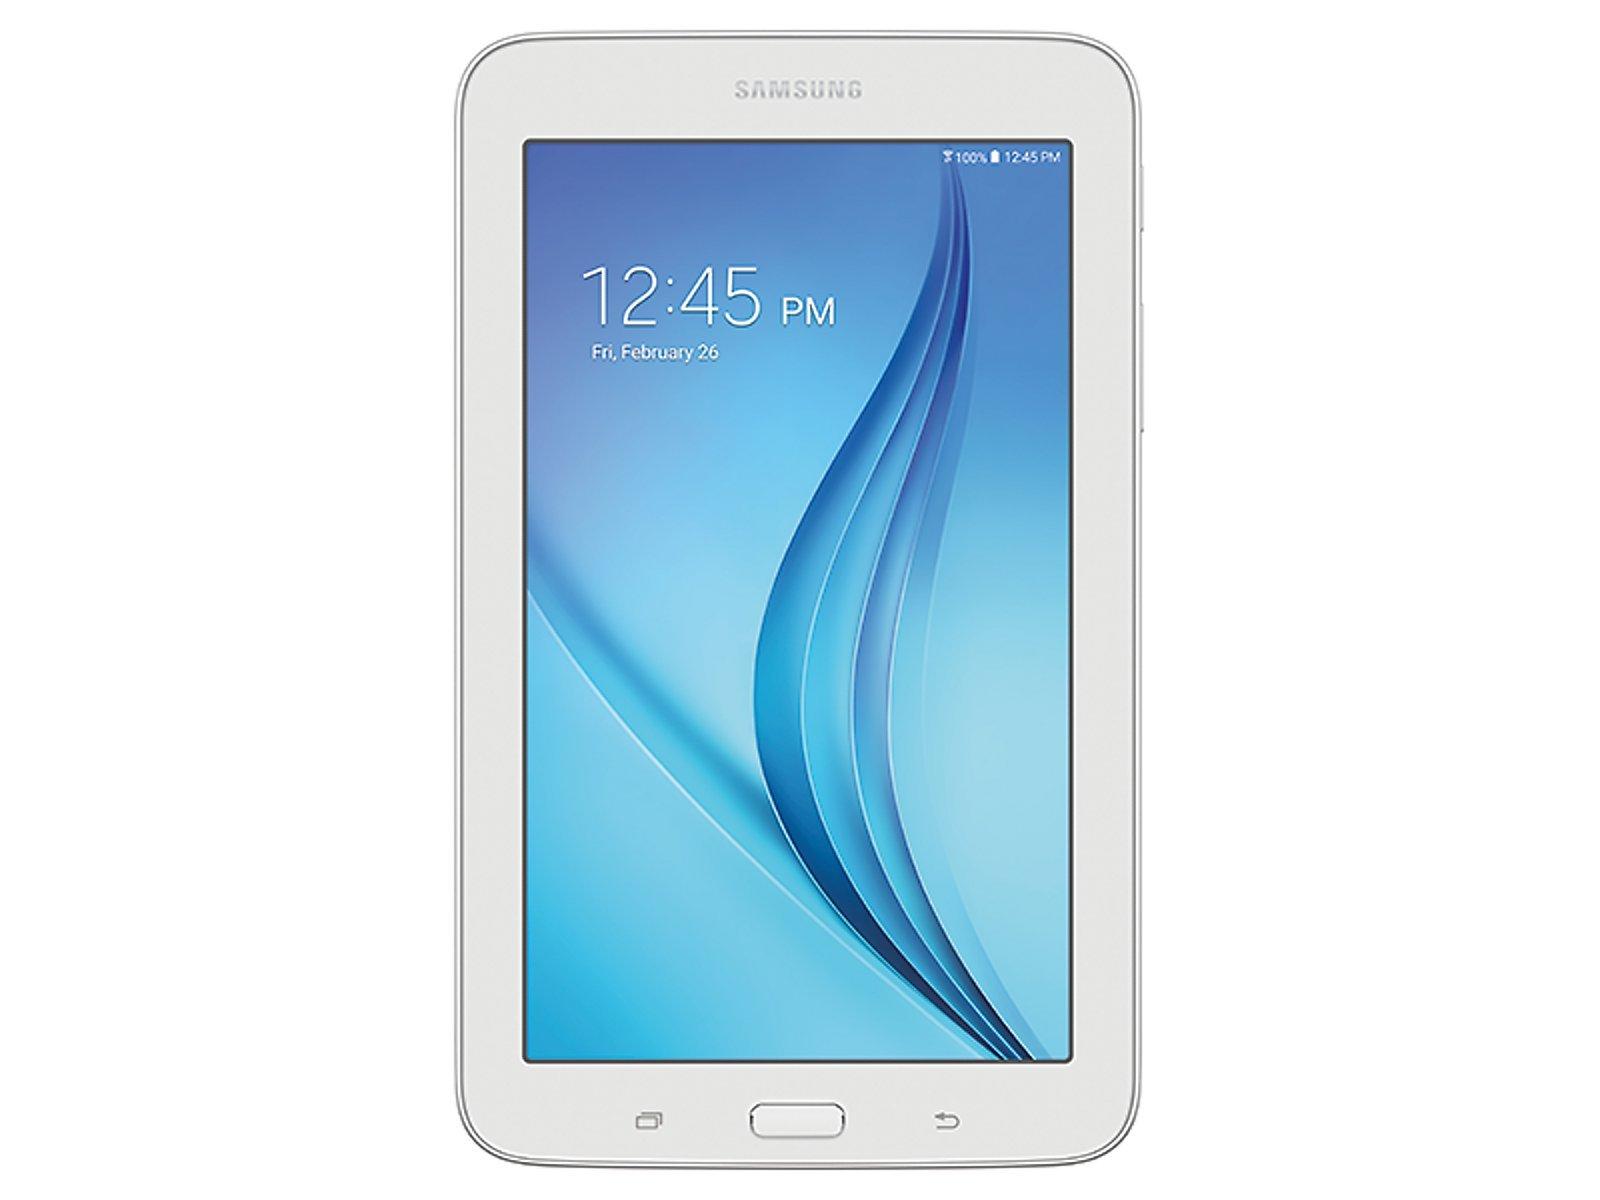 Samsung Galaxy Tab E Lite 7.0'' 8GB Wi-Fi (White) (Certified Refurbished)